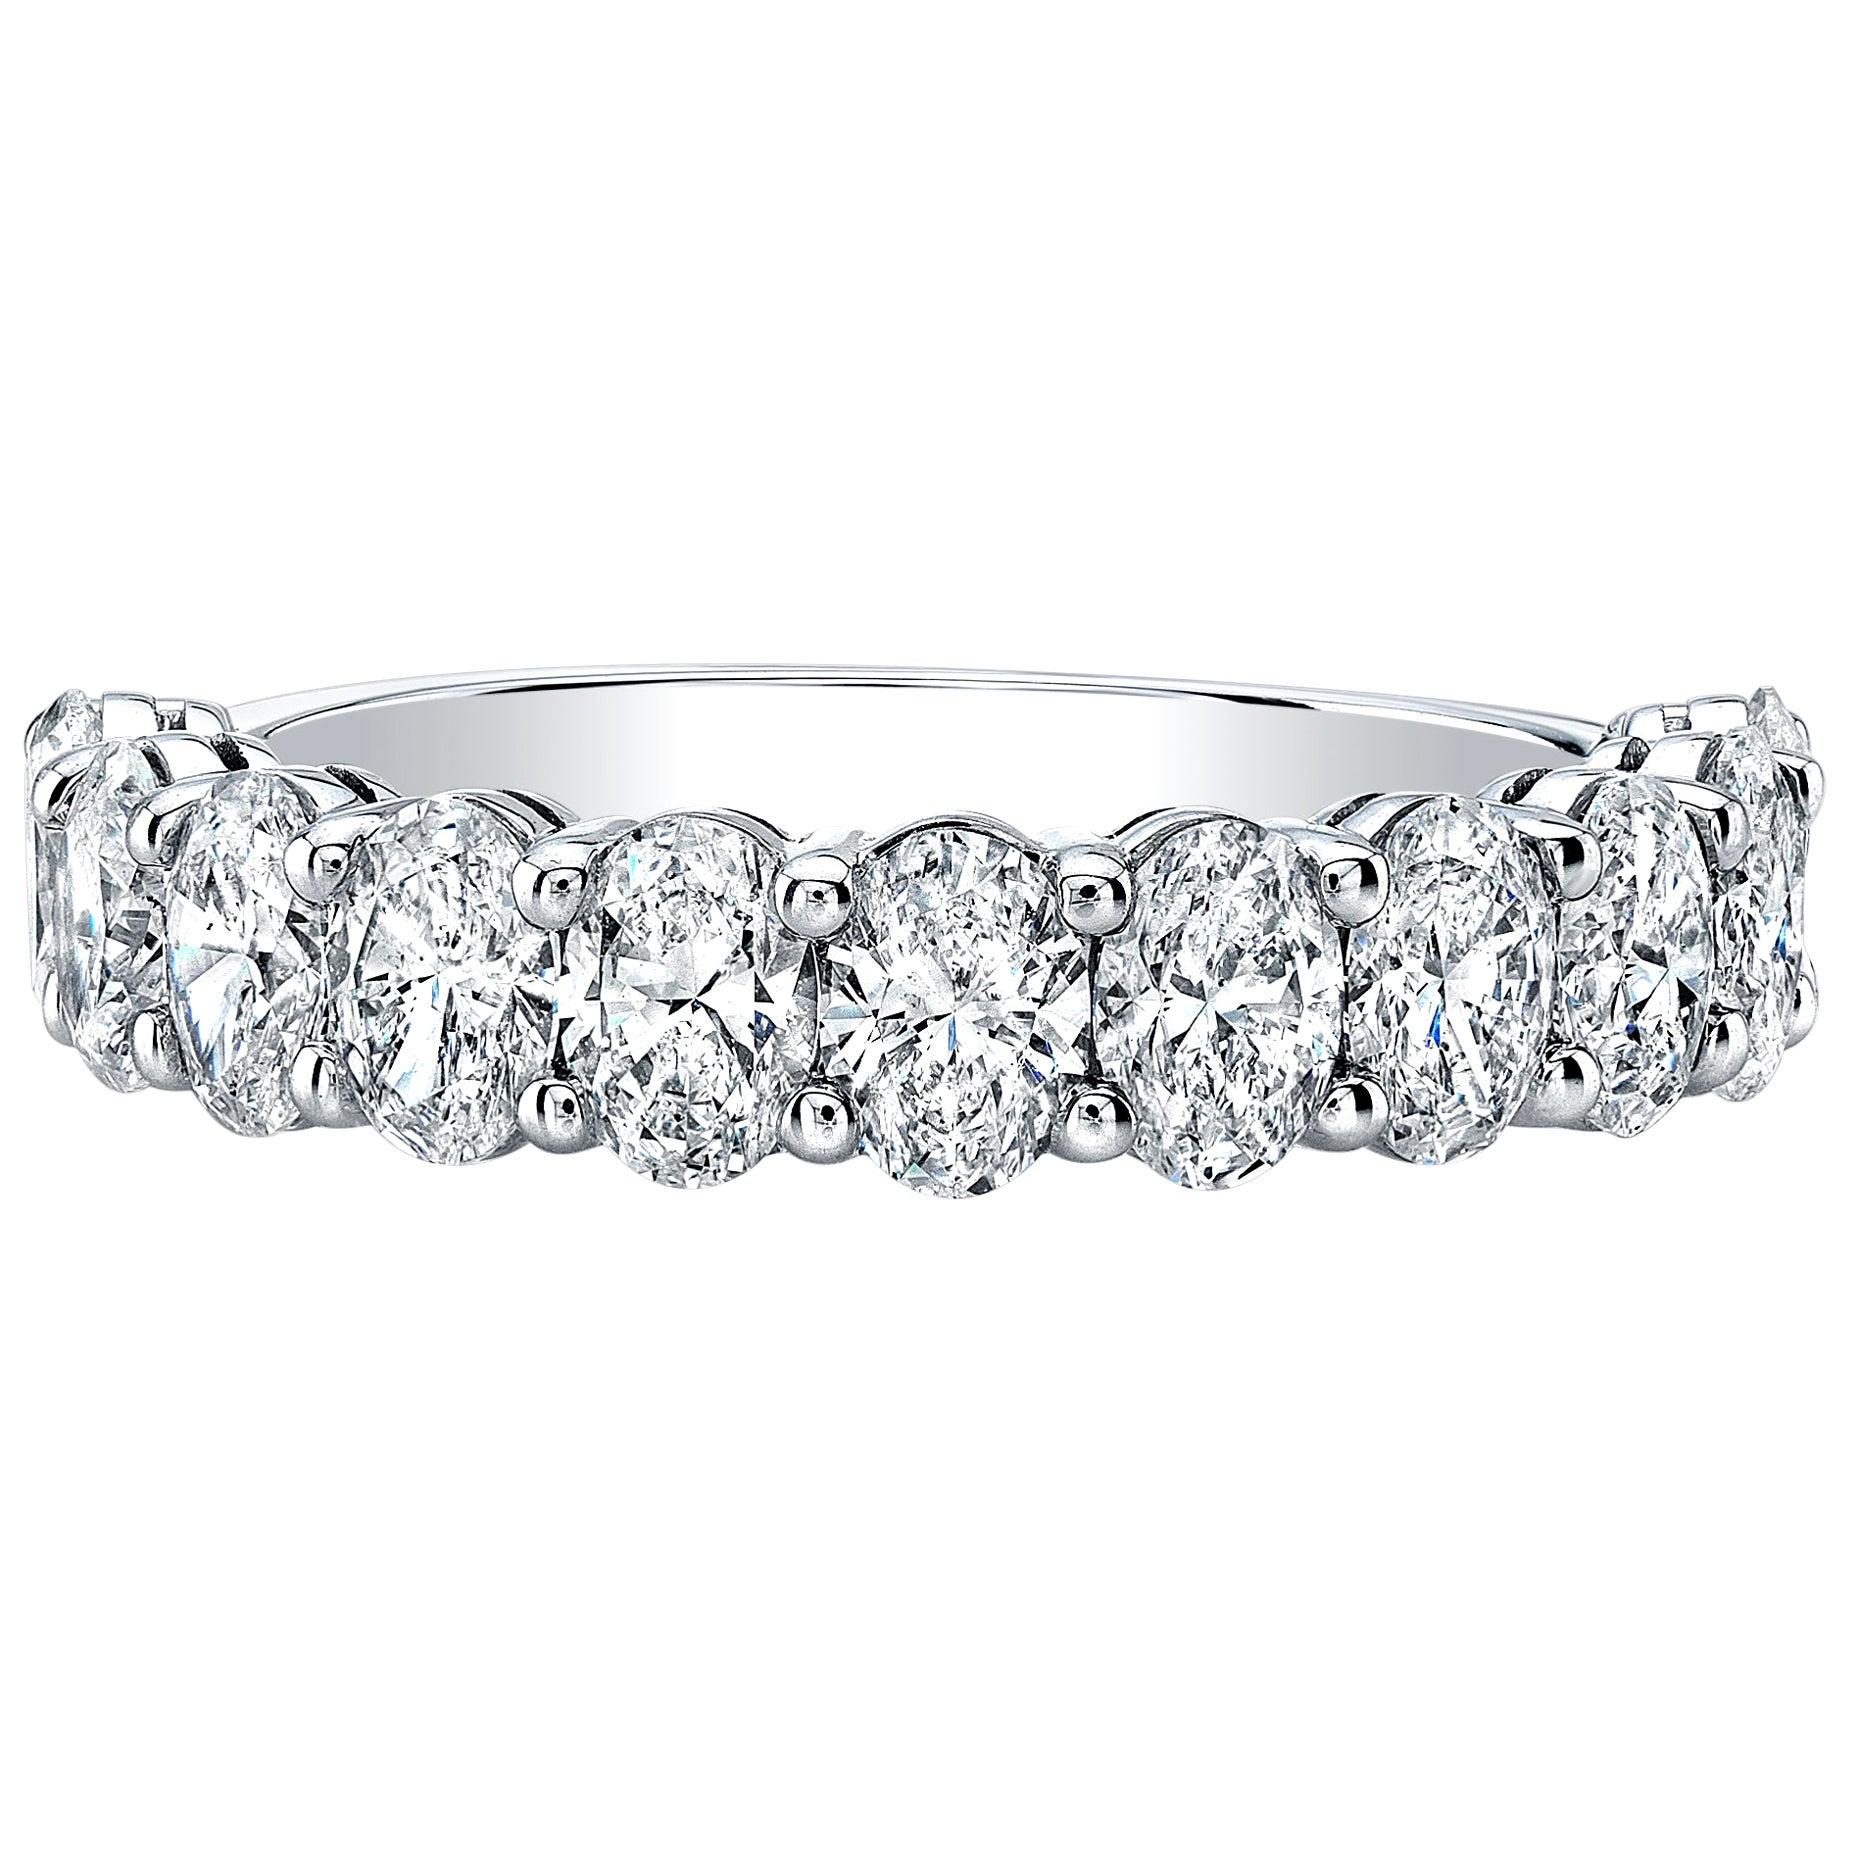 Oval Cut Diamonds Eternity Band